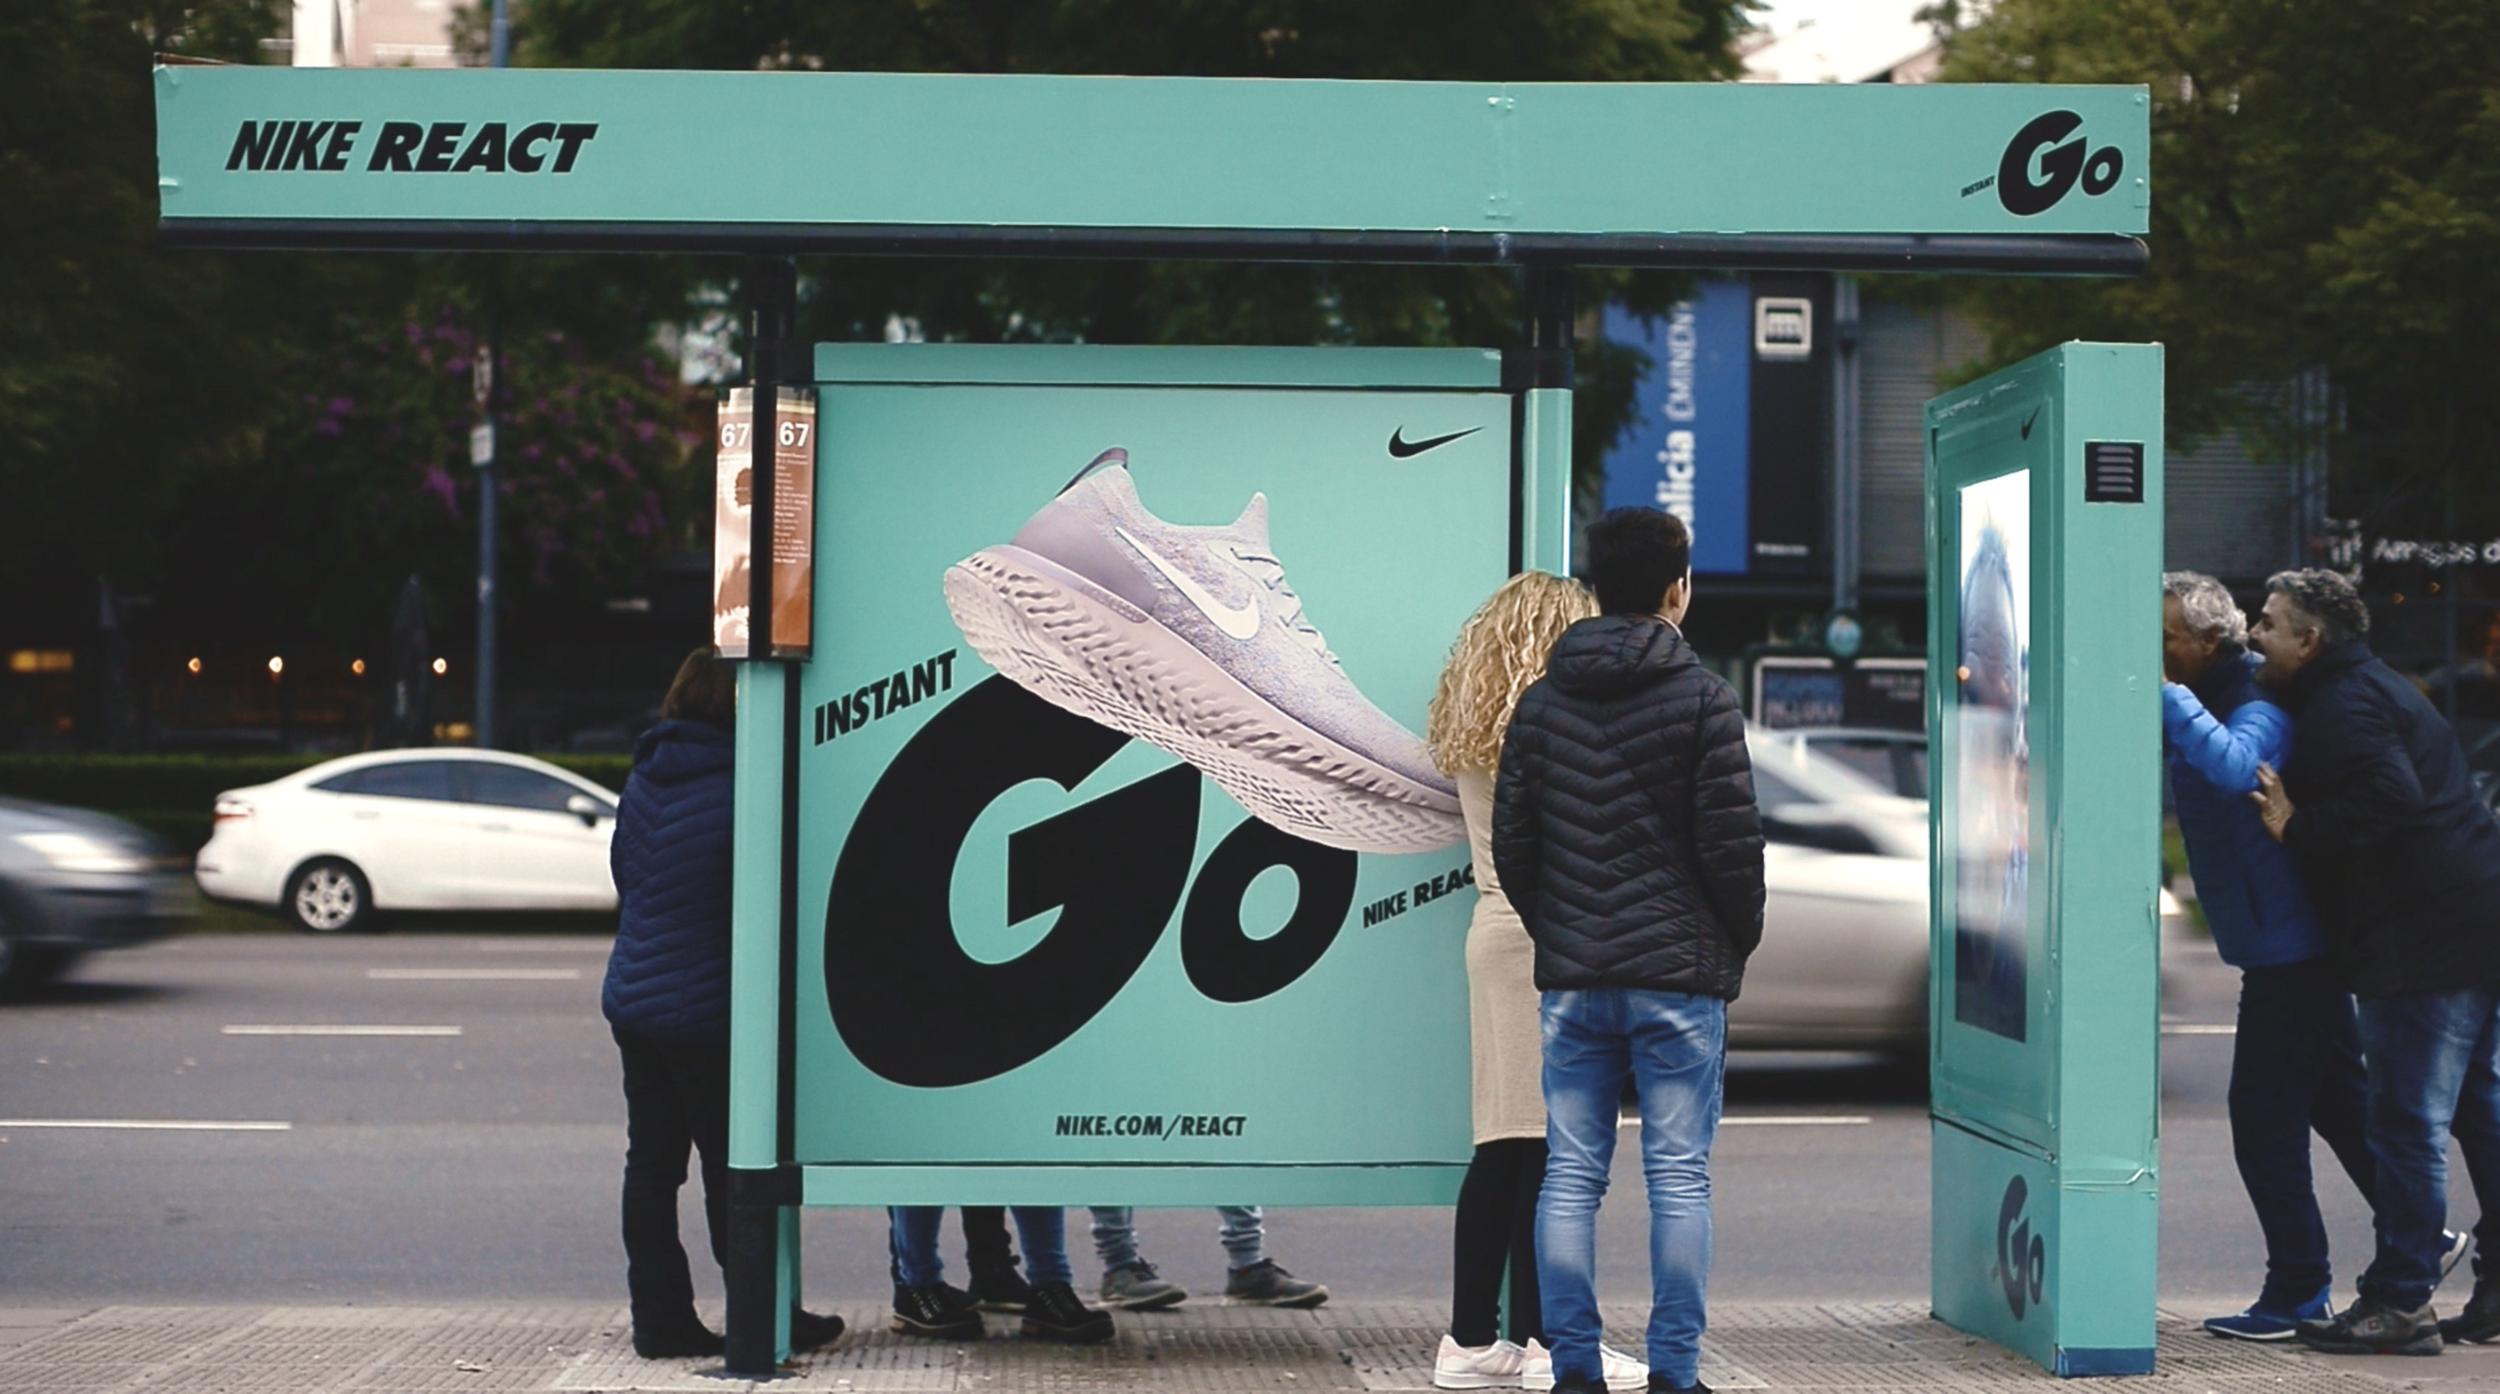 Nike React Bus Stop_6.png